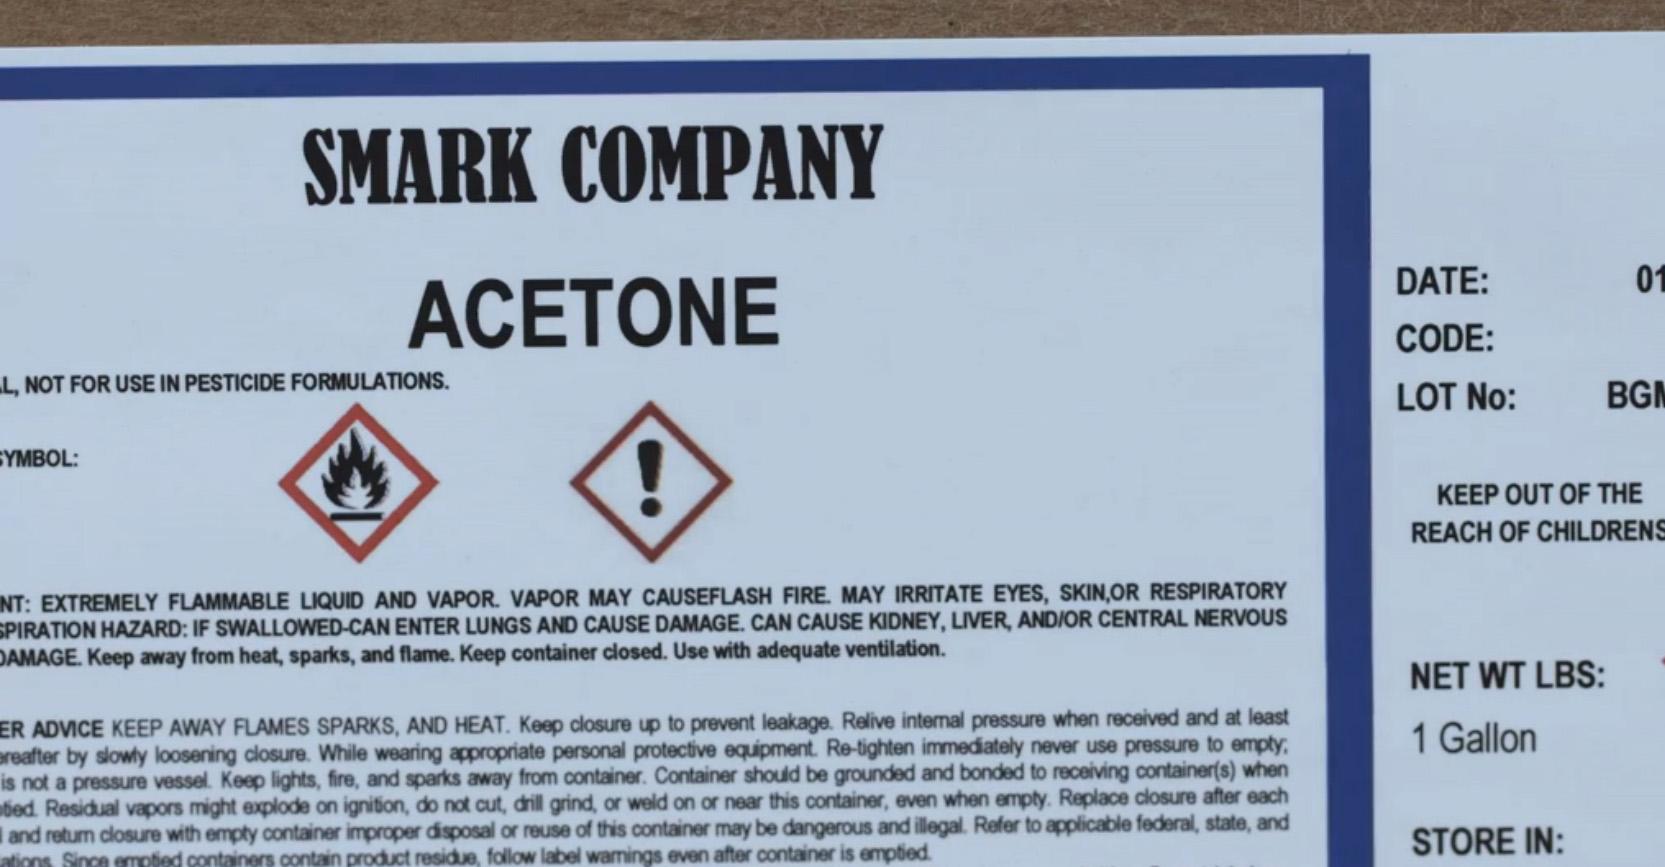 Smark Company Acetone Label Close-up Sample